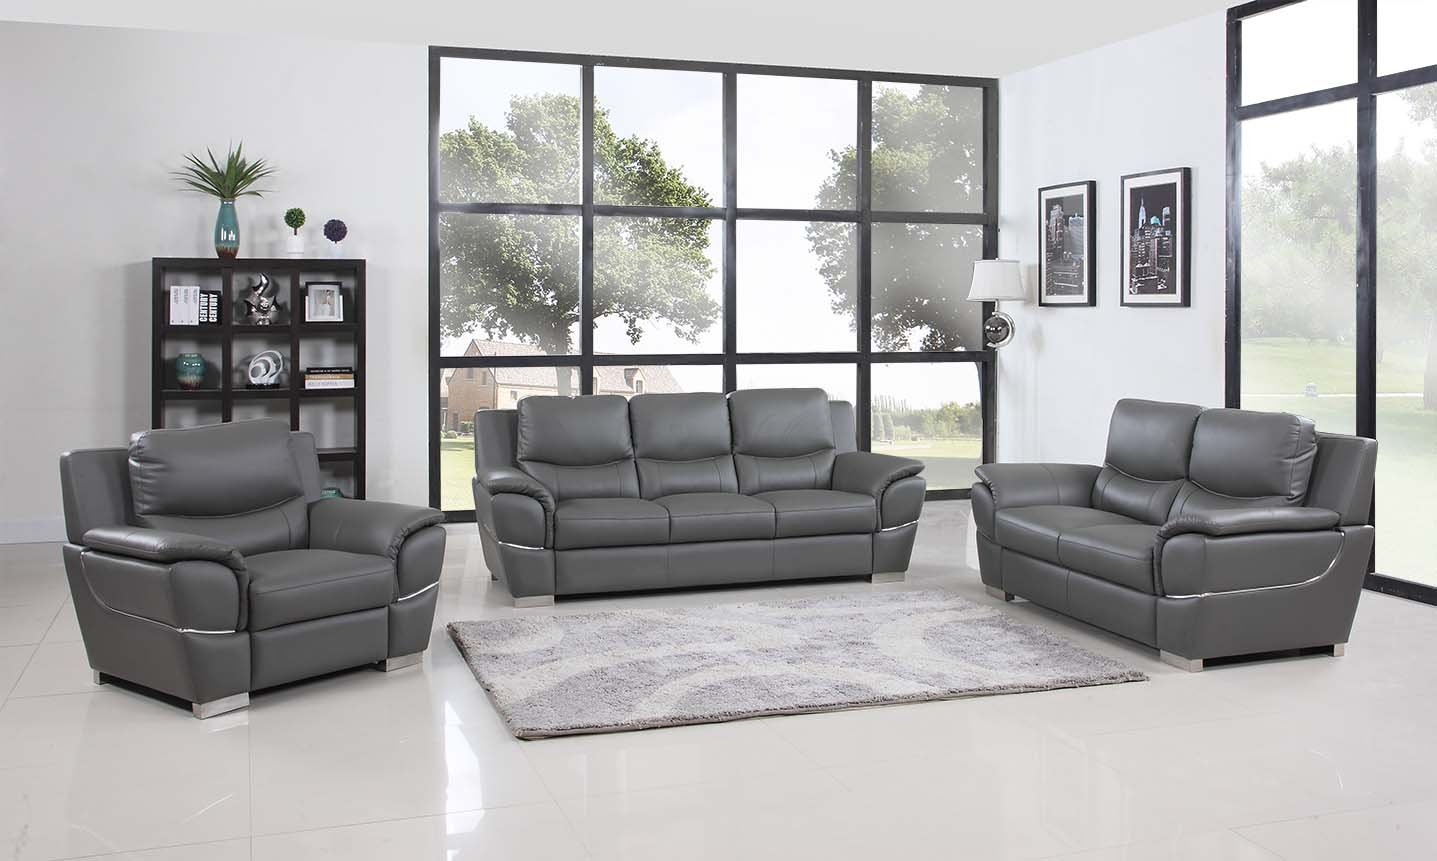 Blackjack Furniture Sofa Set Leather Match, Loveseat, Chair, Gray by Blackjack Furniture